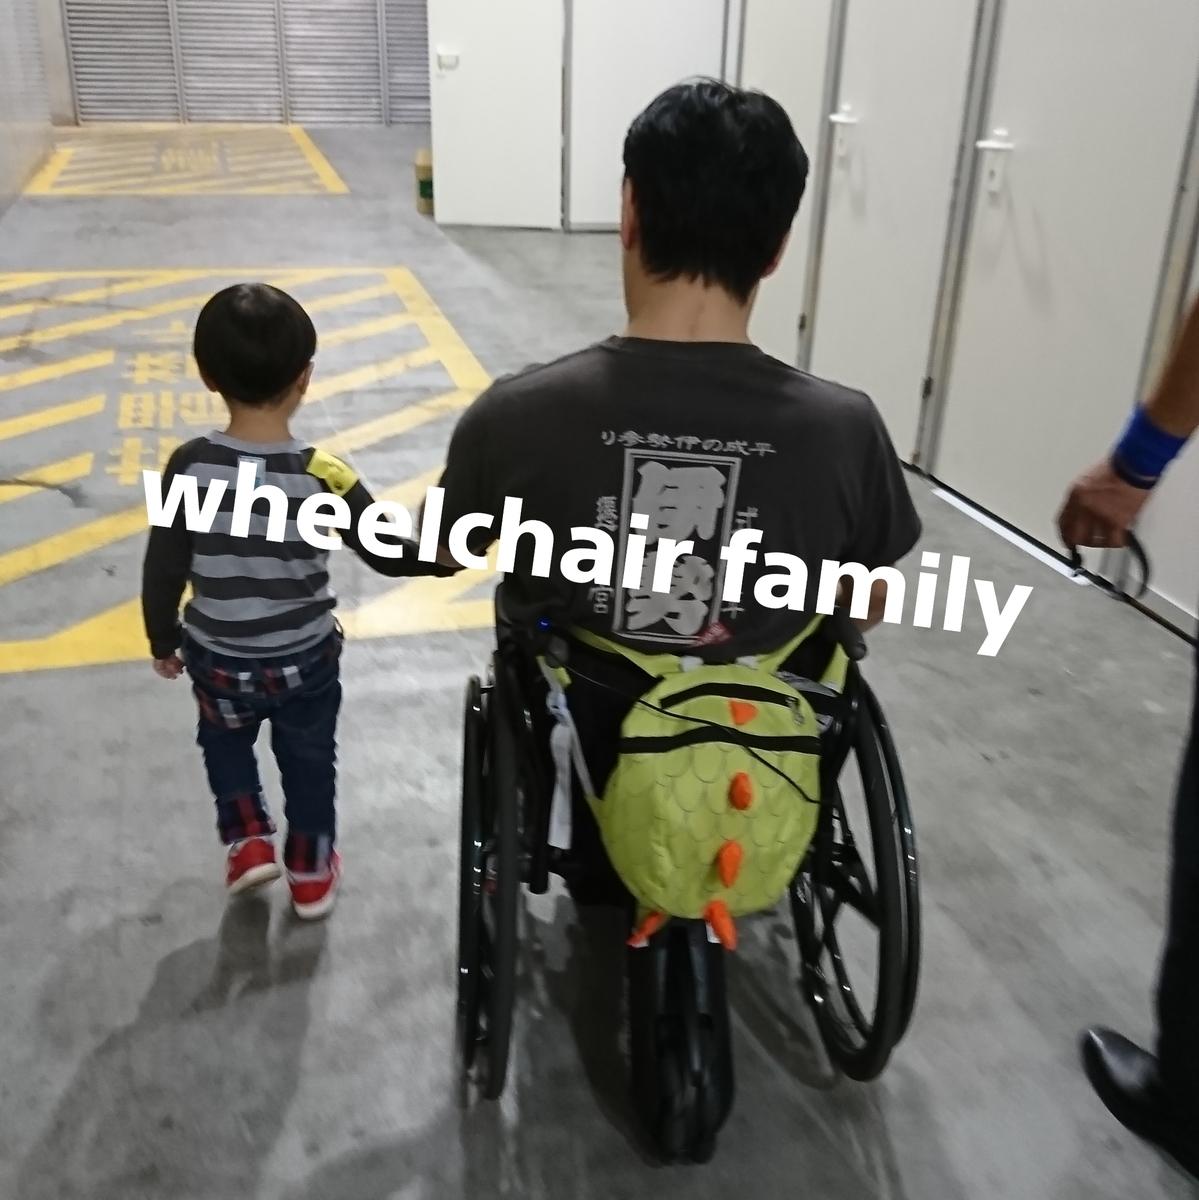 f:id:WheelchairFamily:20191002132245j:plain